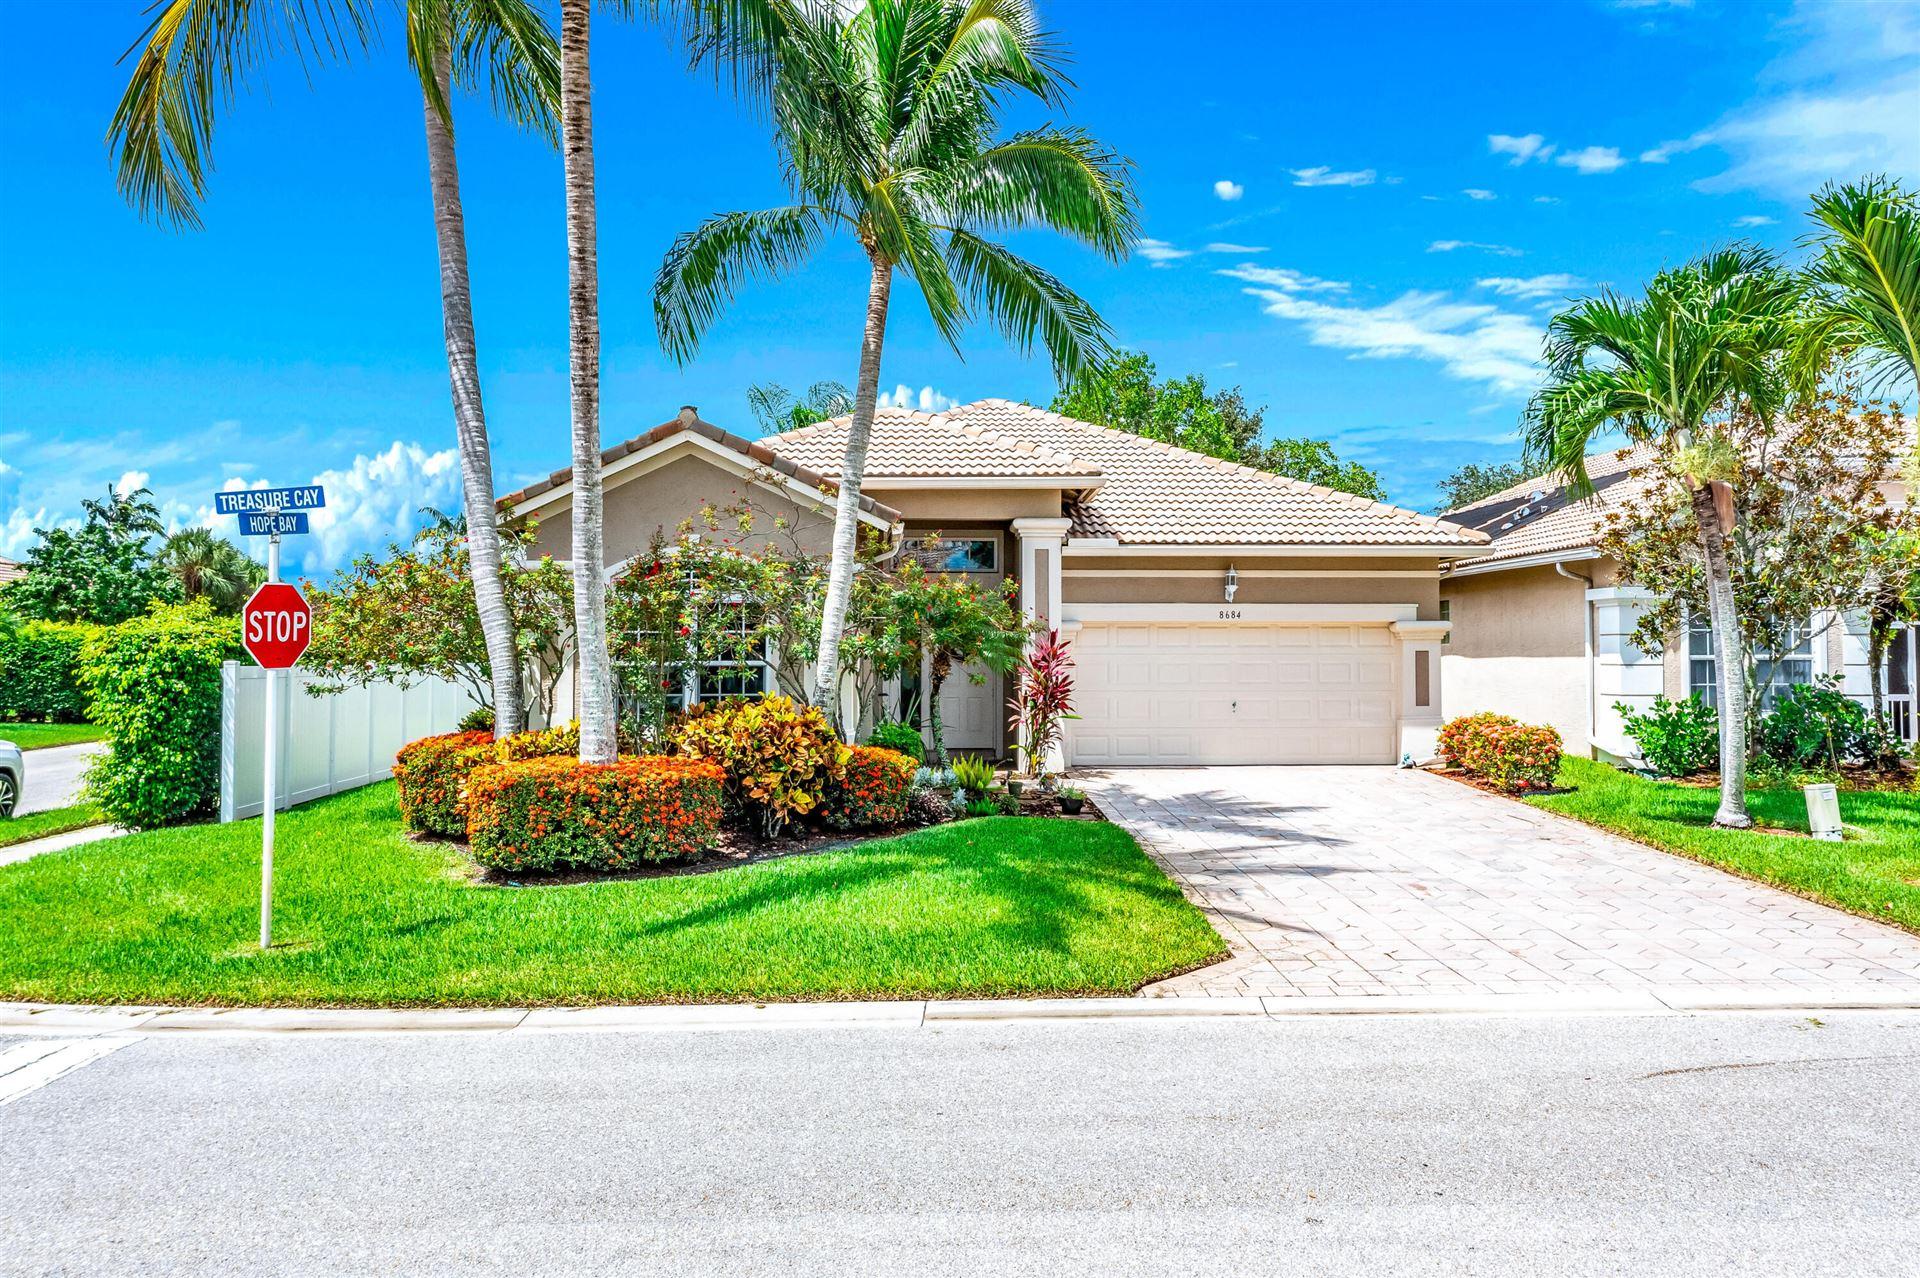 8684 Treasure Cay, West Palm Beach, FL 33411 - MLS#: RX-10732524